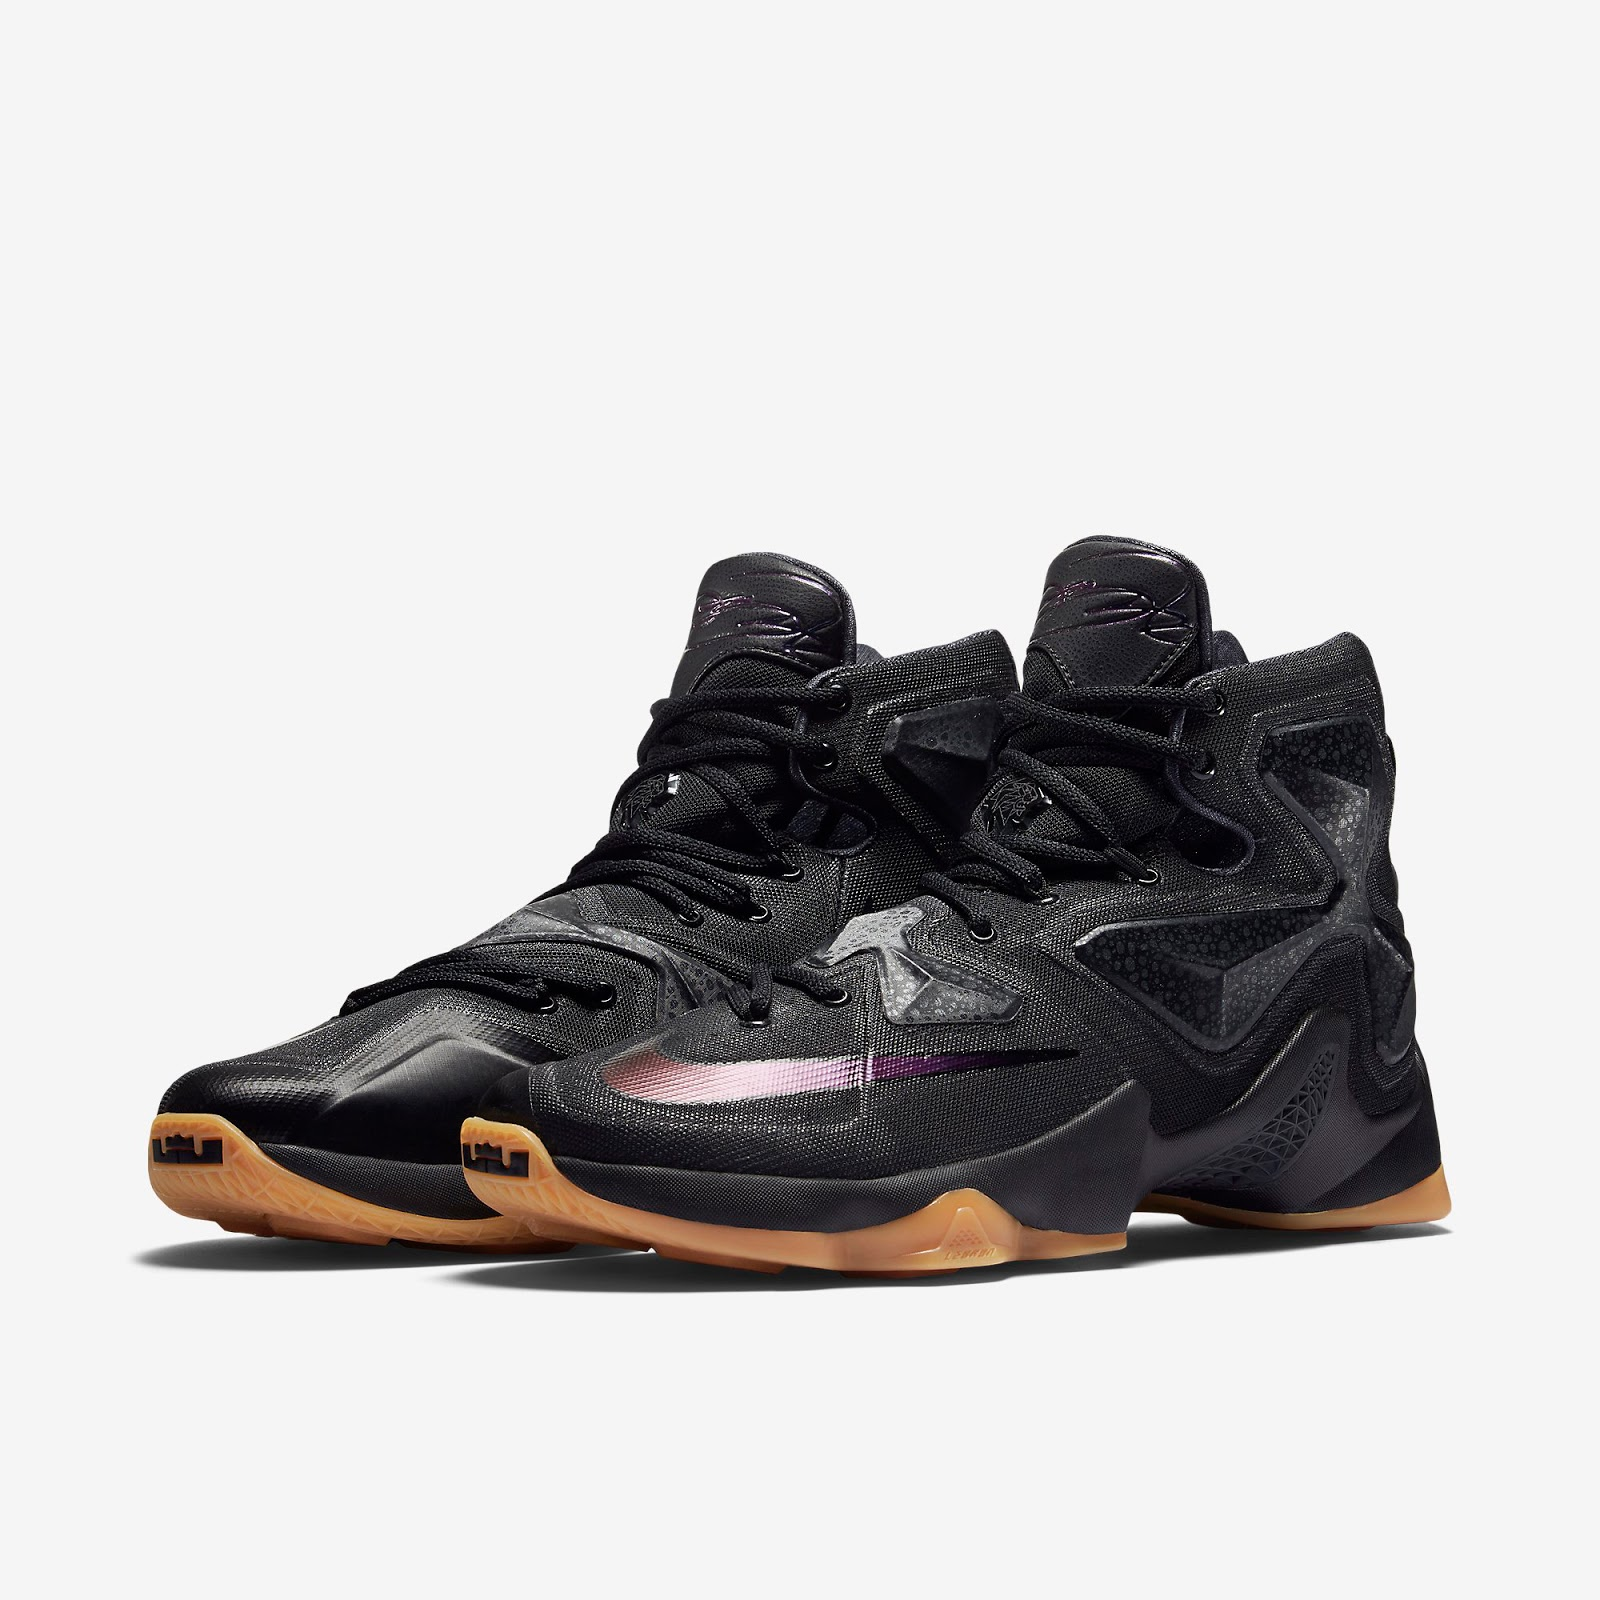 timeless design 19baf cbd8a ajordanxi Your #1 Source For Sneaker Release Dates: Nike ...